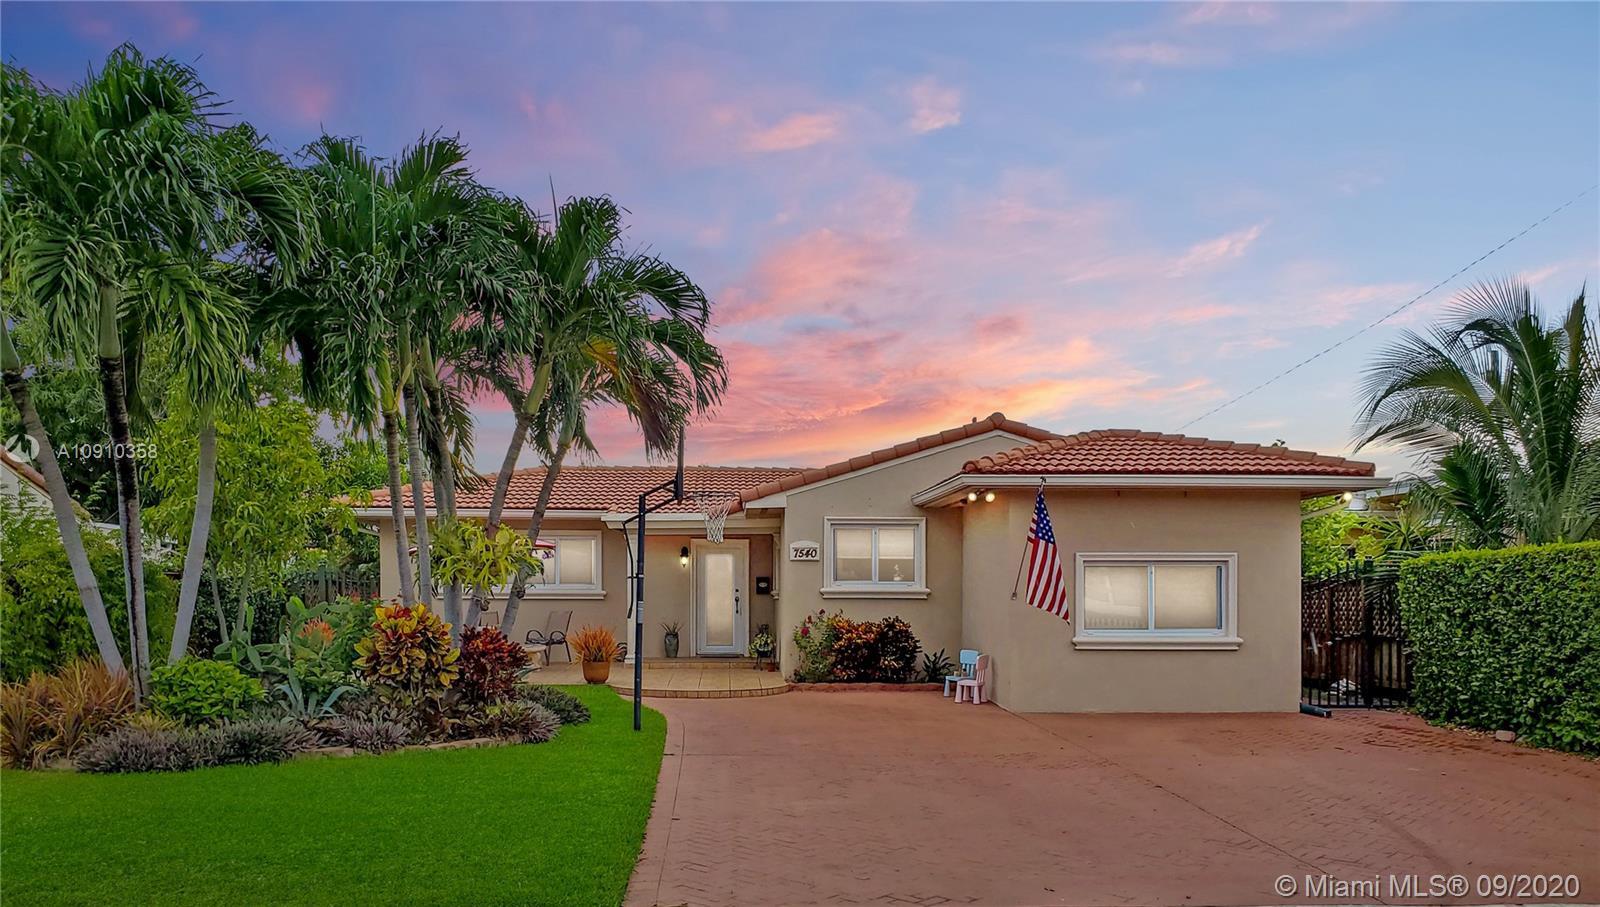 7540  Cutlass Ave  For Sale A10910358, FL